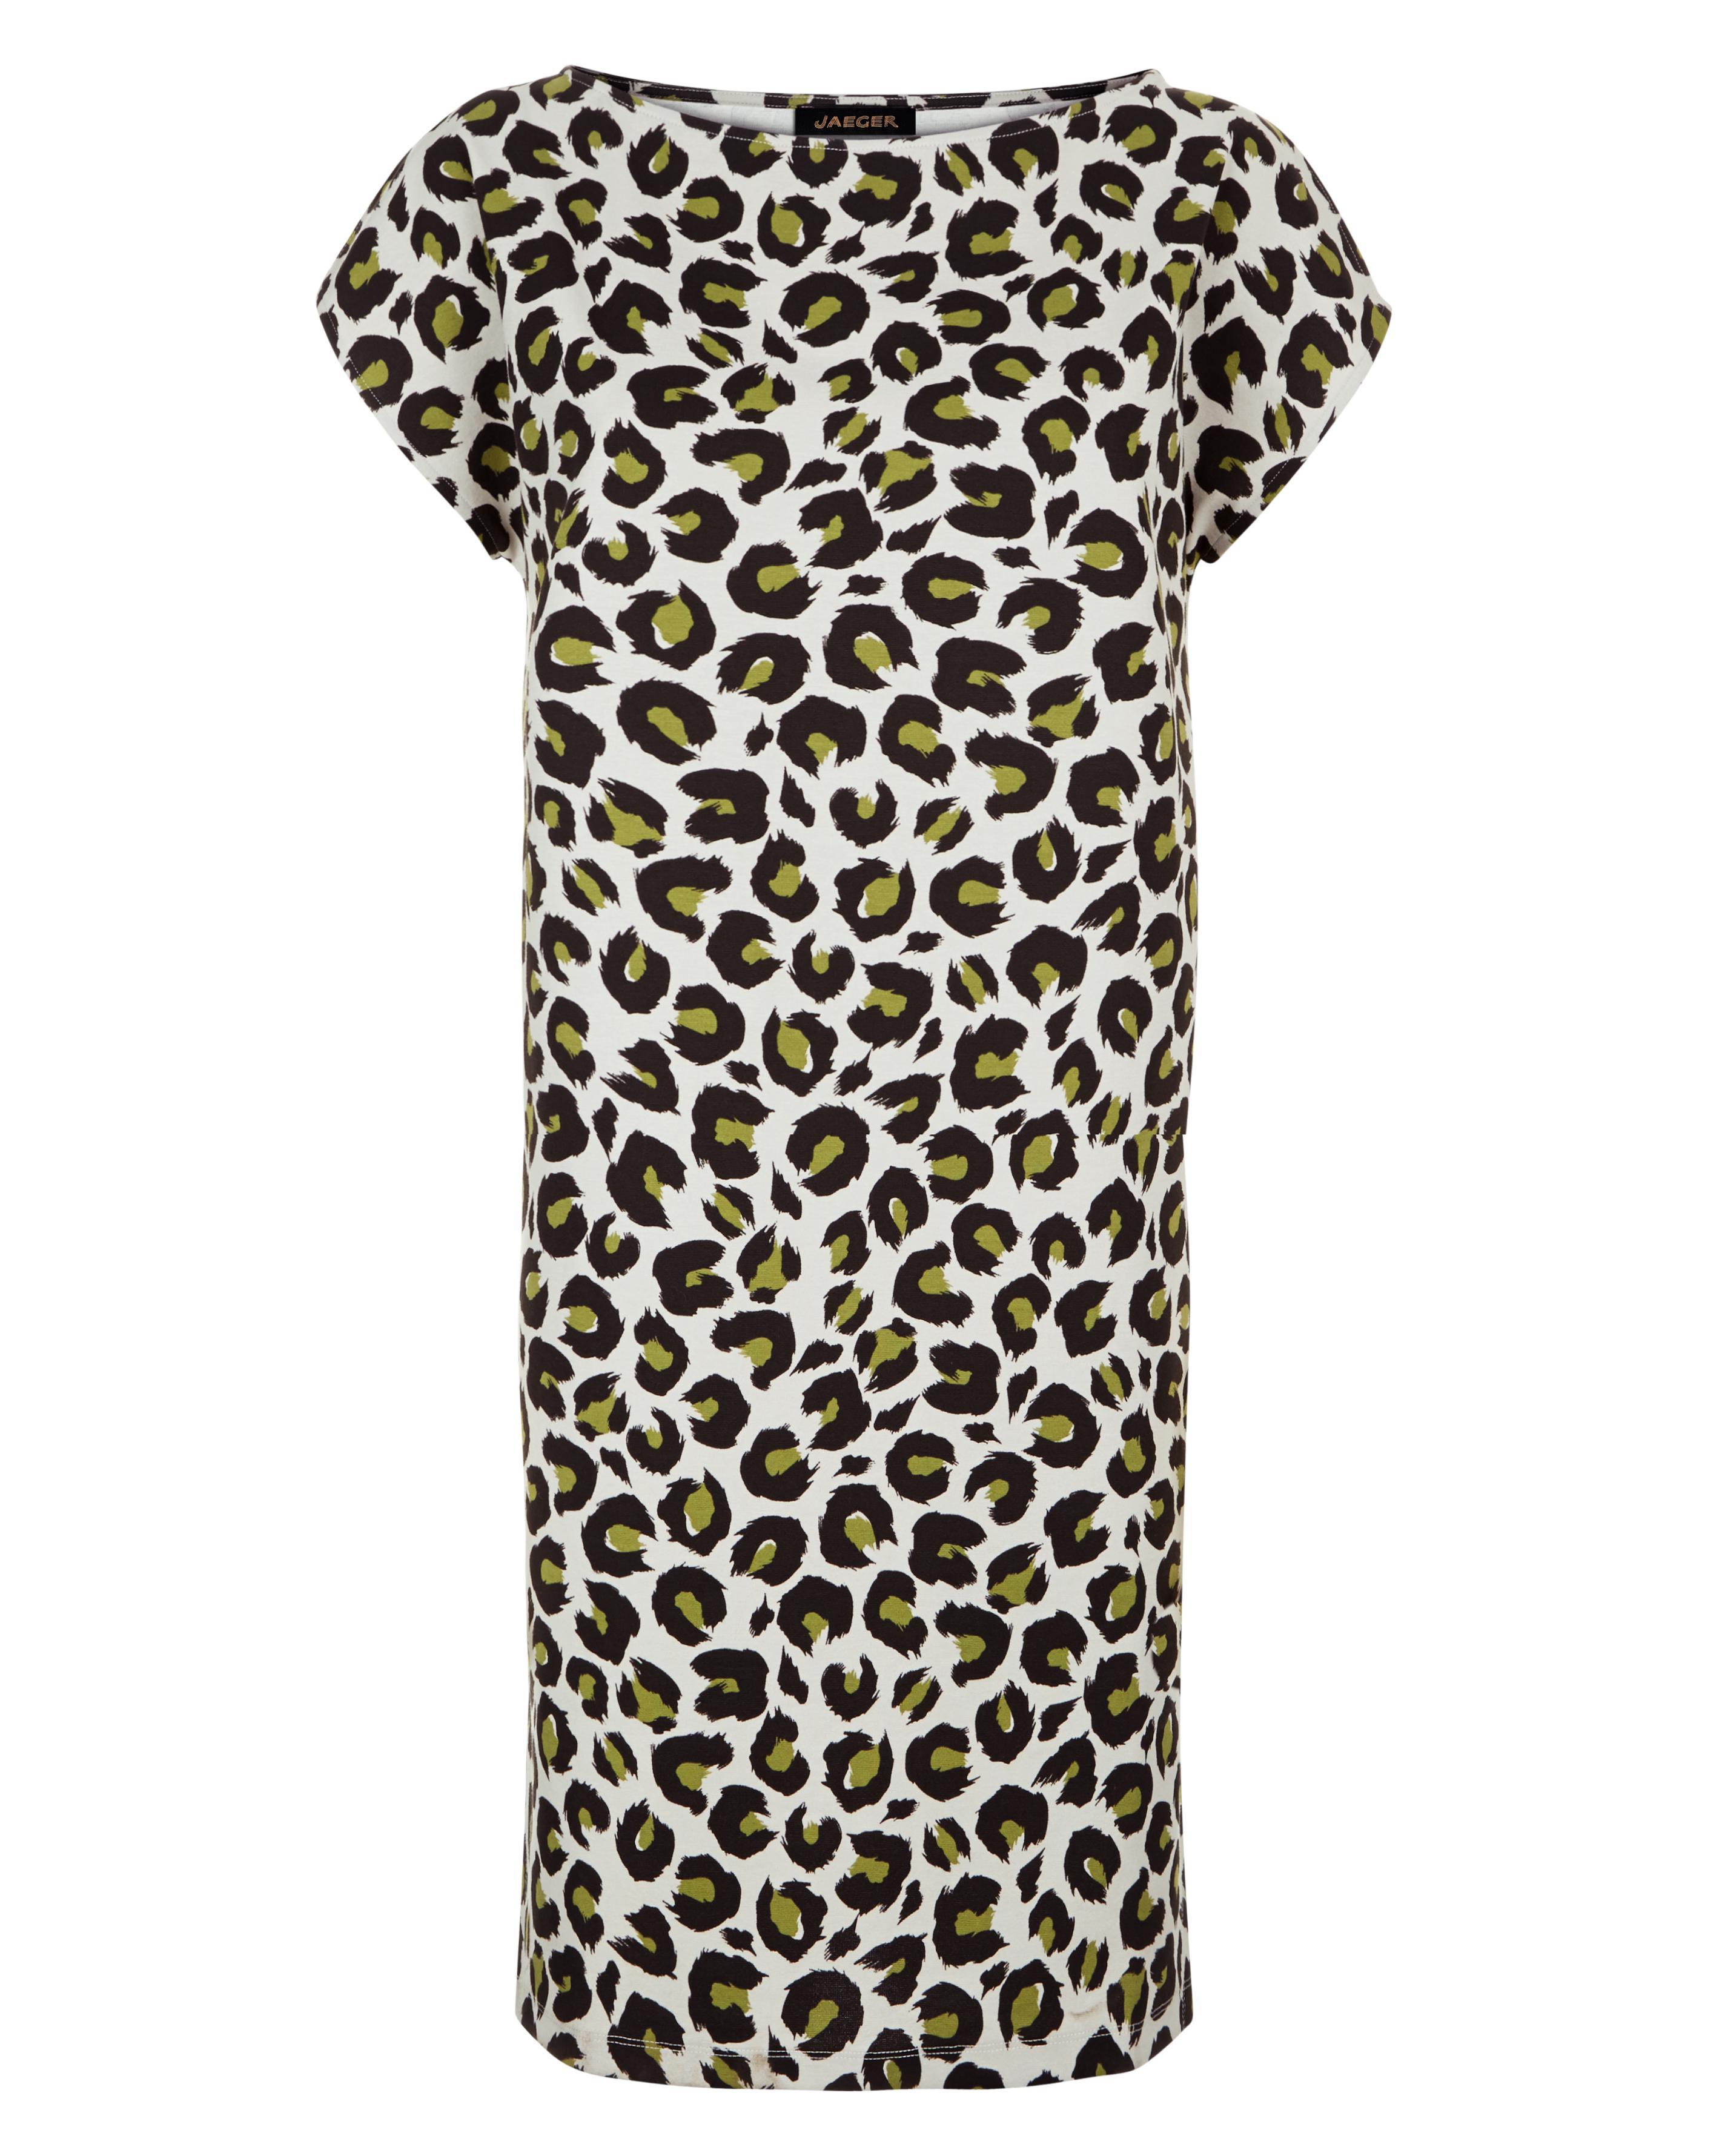 Lyst - Jaeger Jersey Animal Print Dress in Black 0df1dbcf6